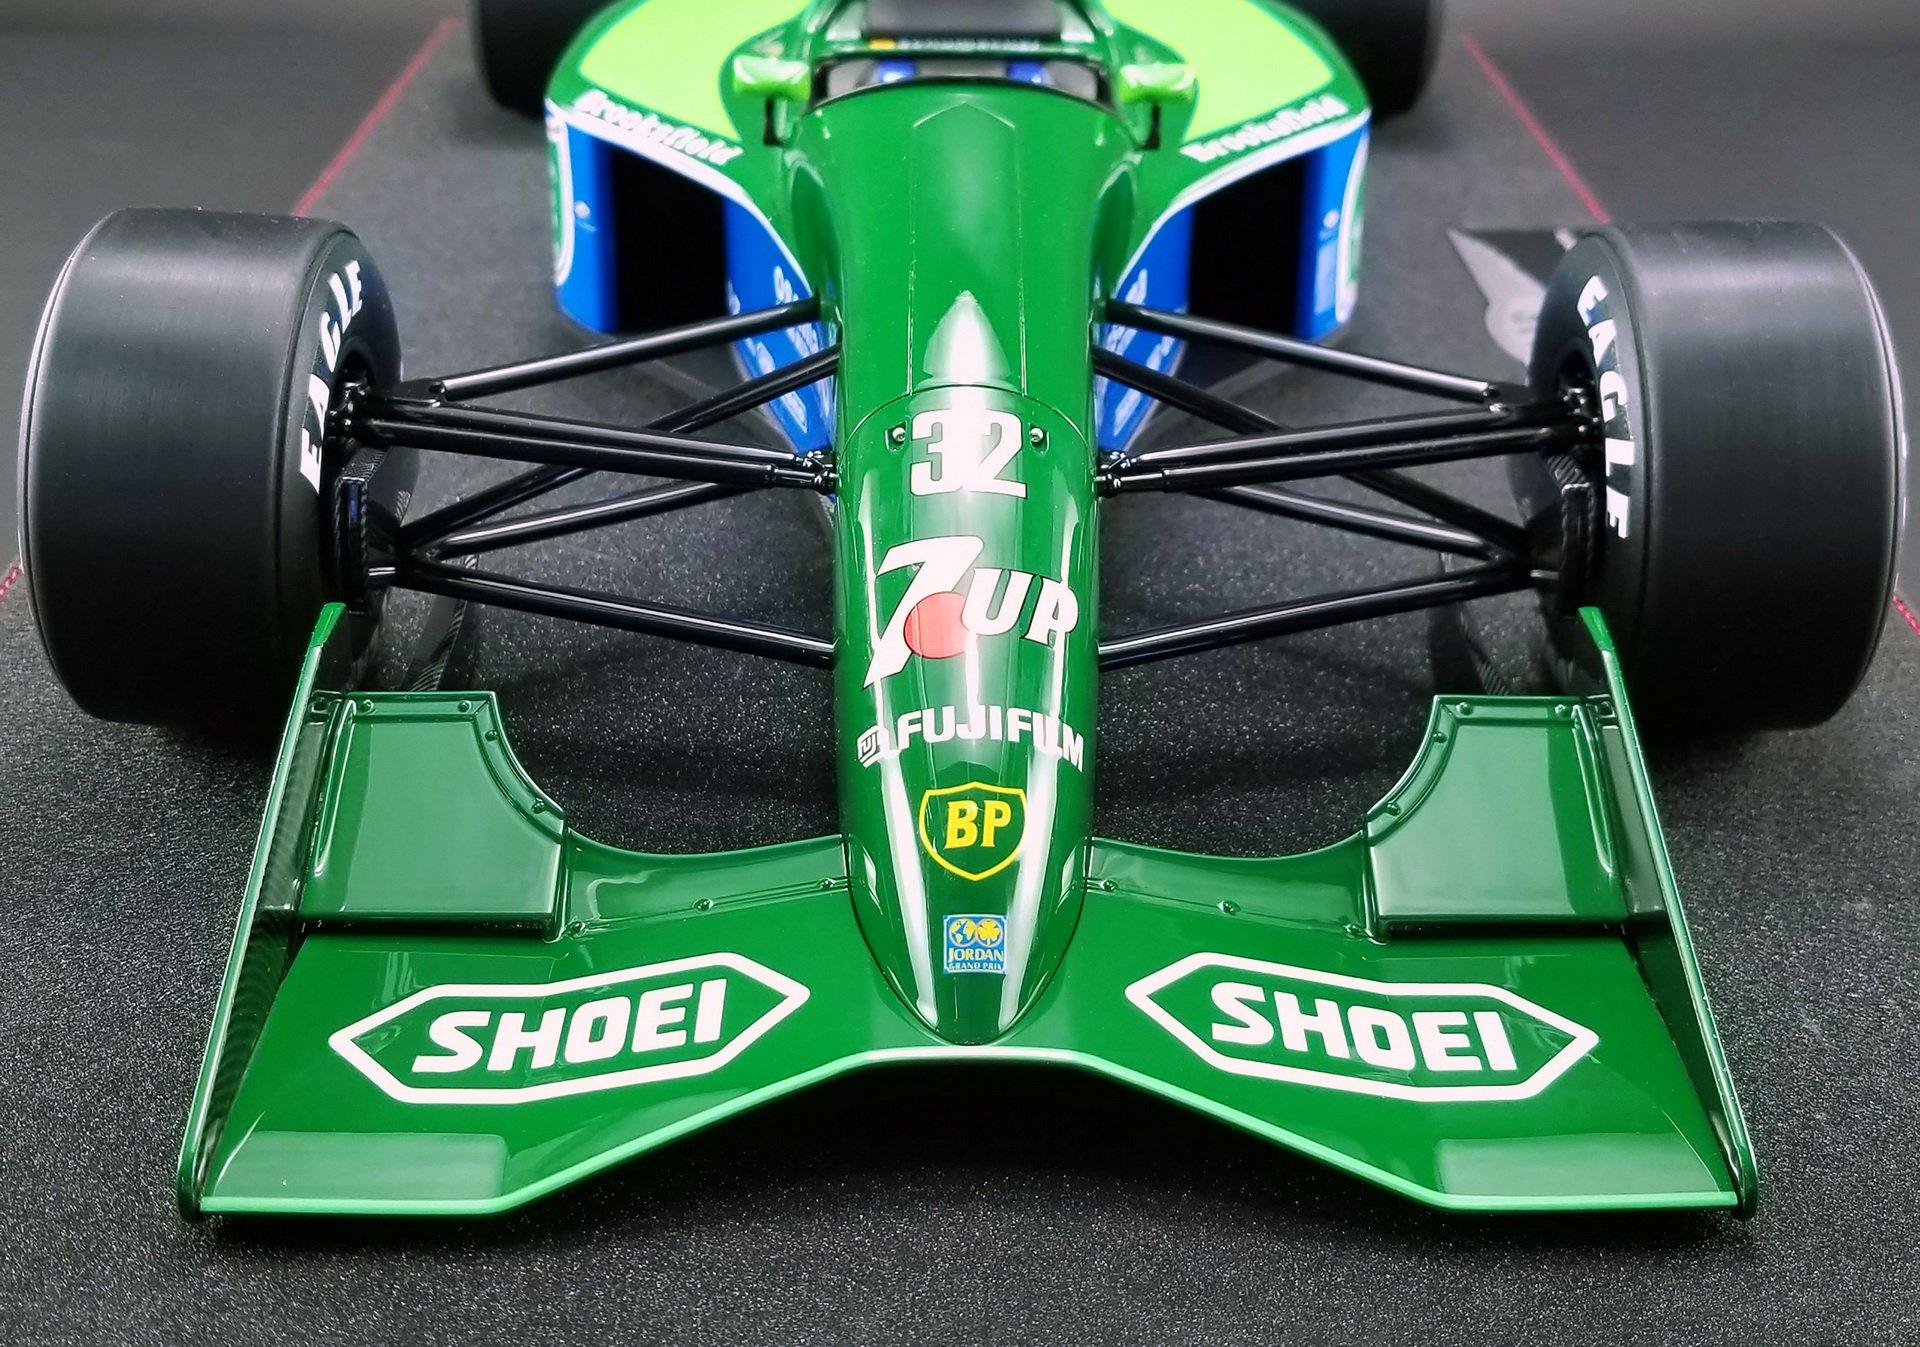 1991_Jordan_F1_car_Schumacher_scale_0005